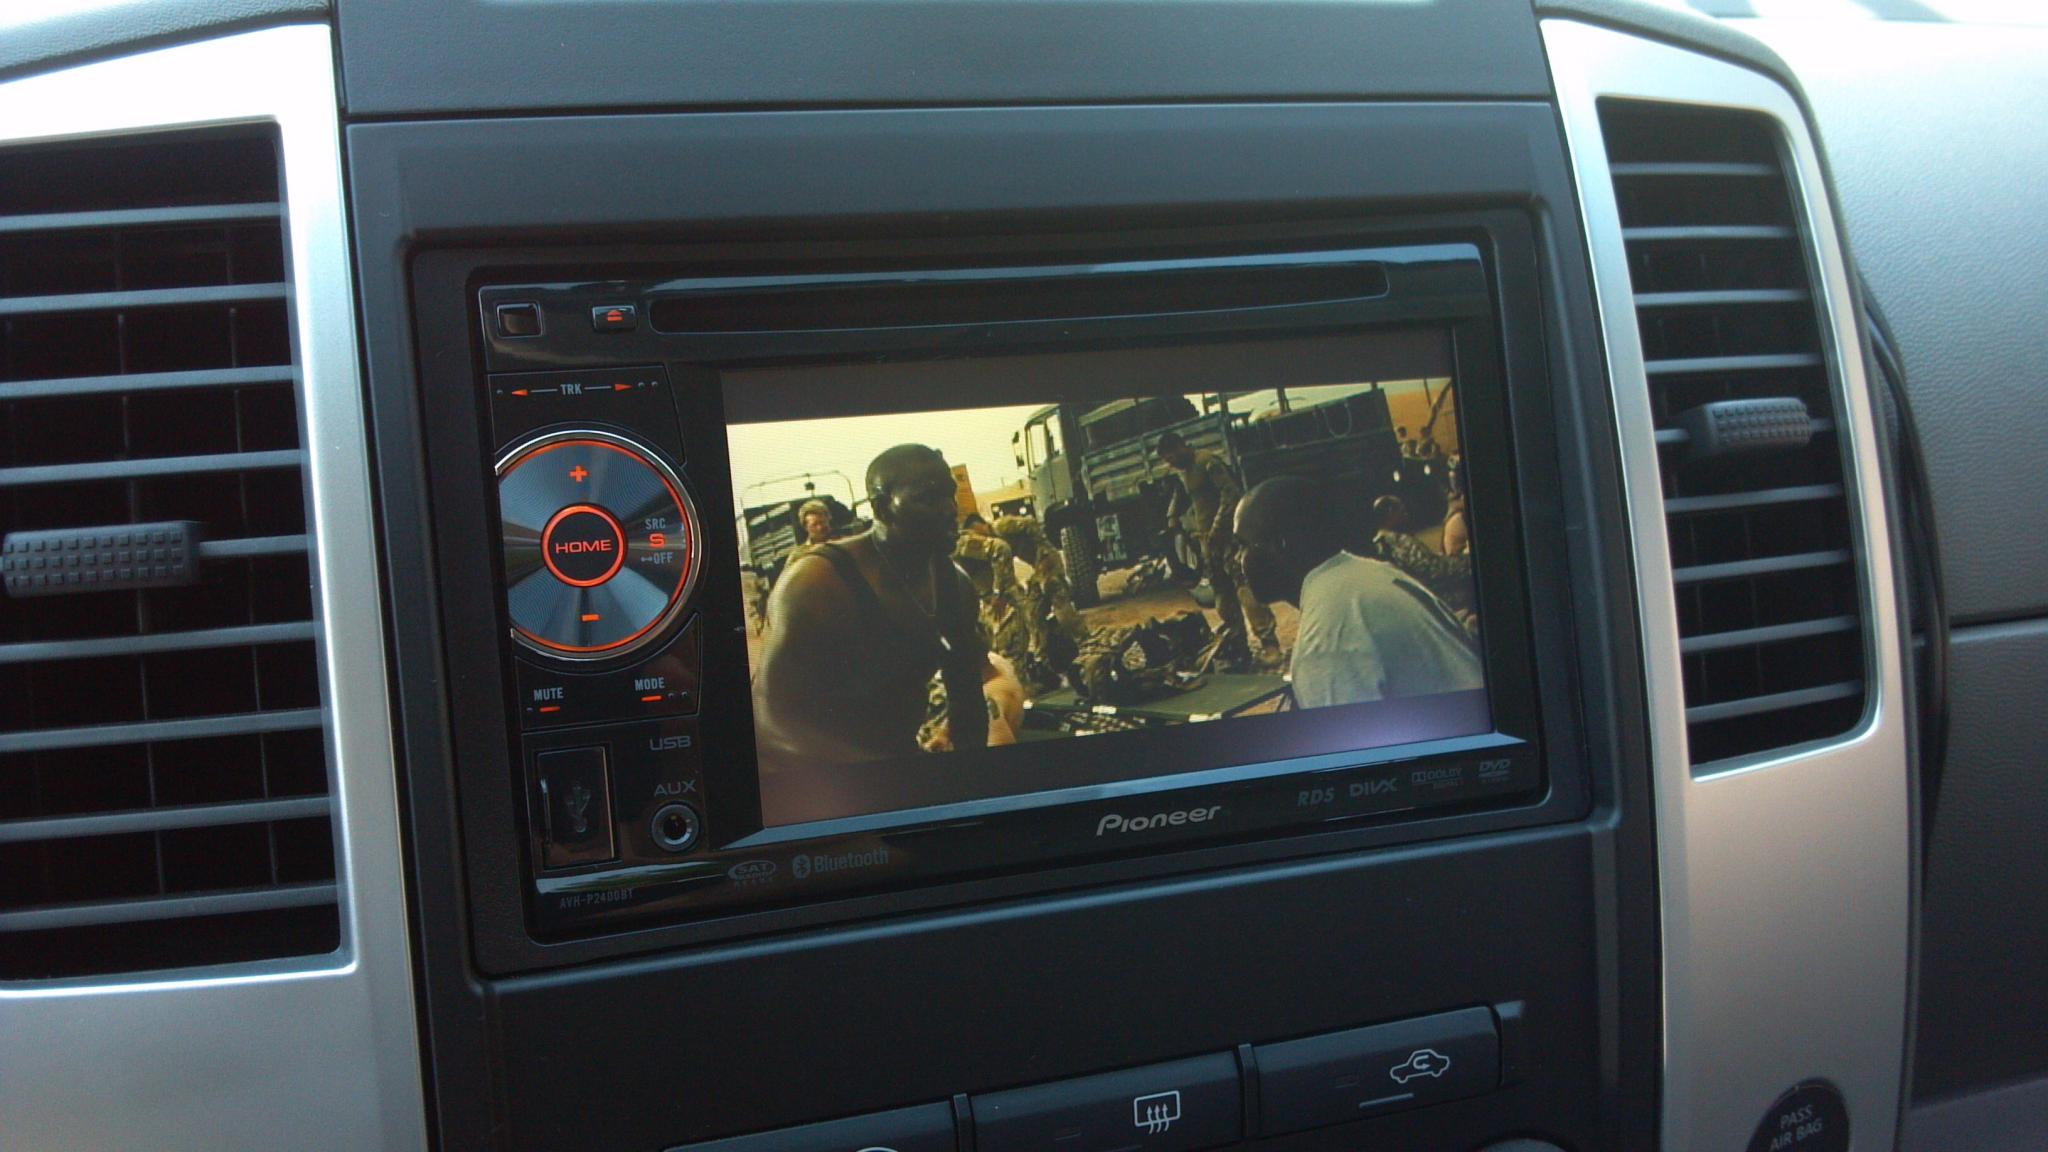 38898d1347728253 2012 sv stock radio 2012 09 01_15 09 06_737 2012 sv stock radio nissan frontier forum 2012 nissan frontier radio wiring harness at crackthecode.co